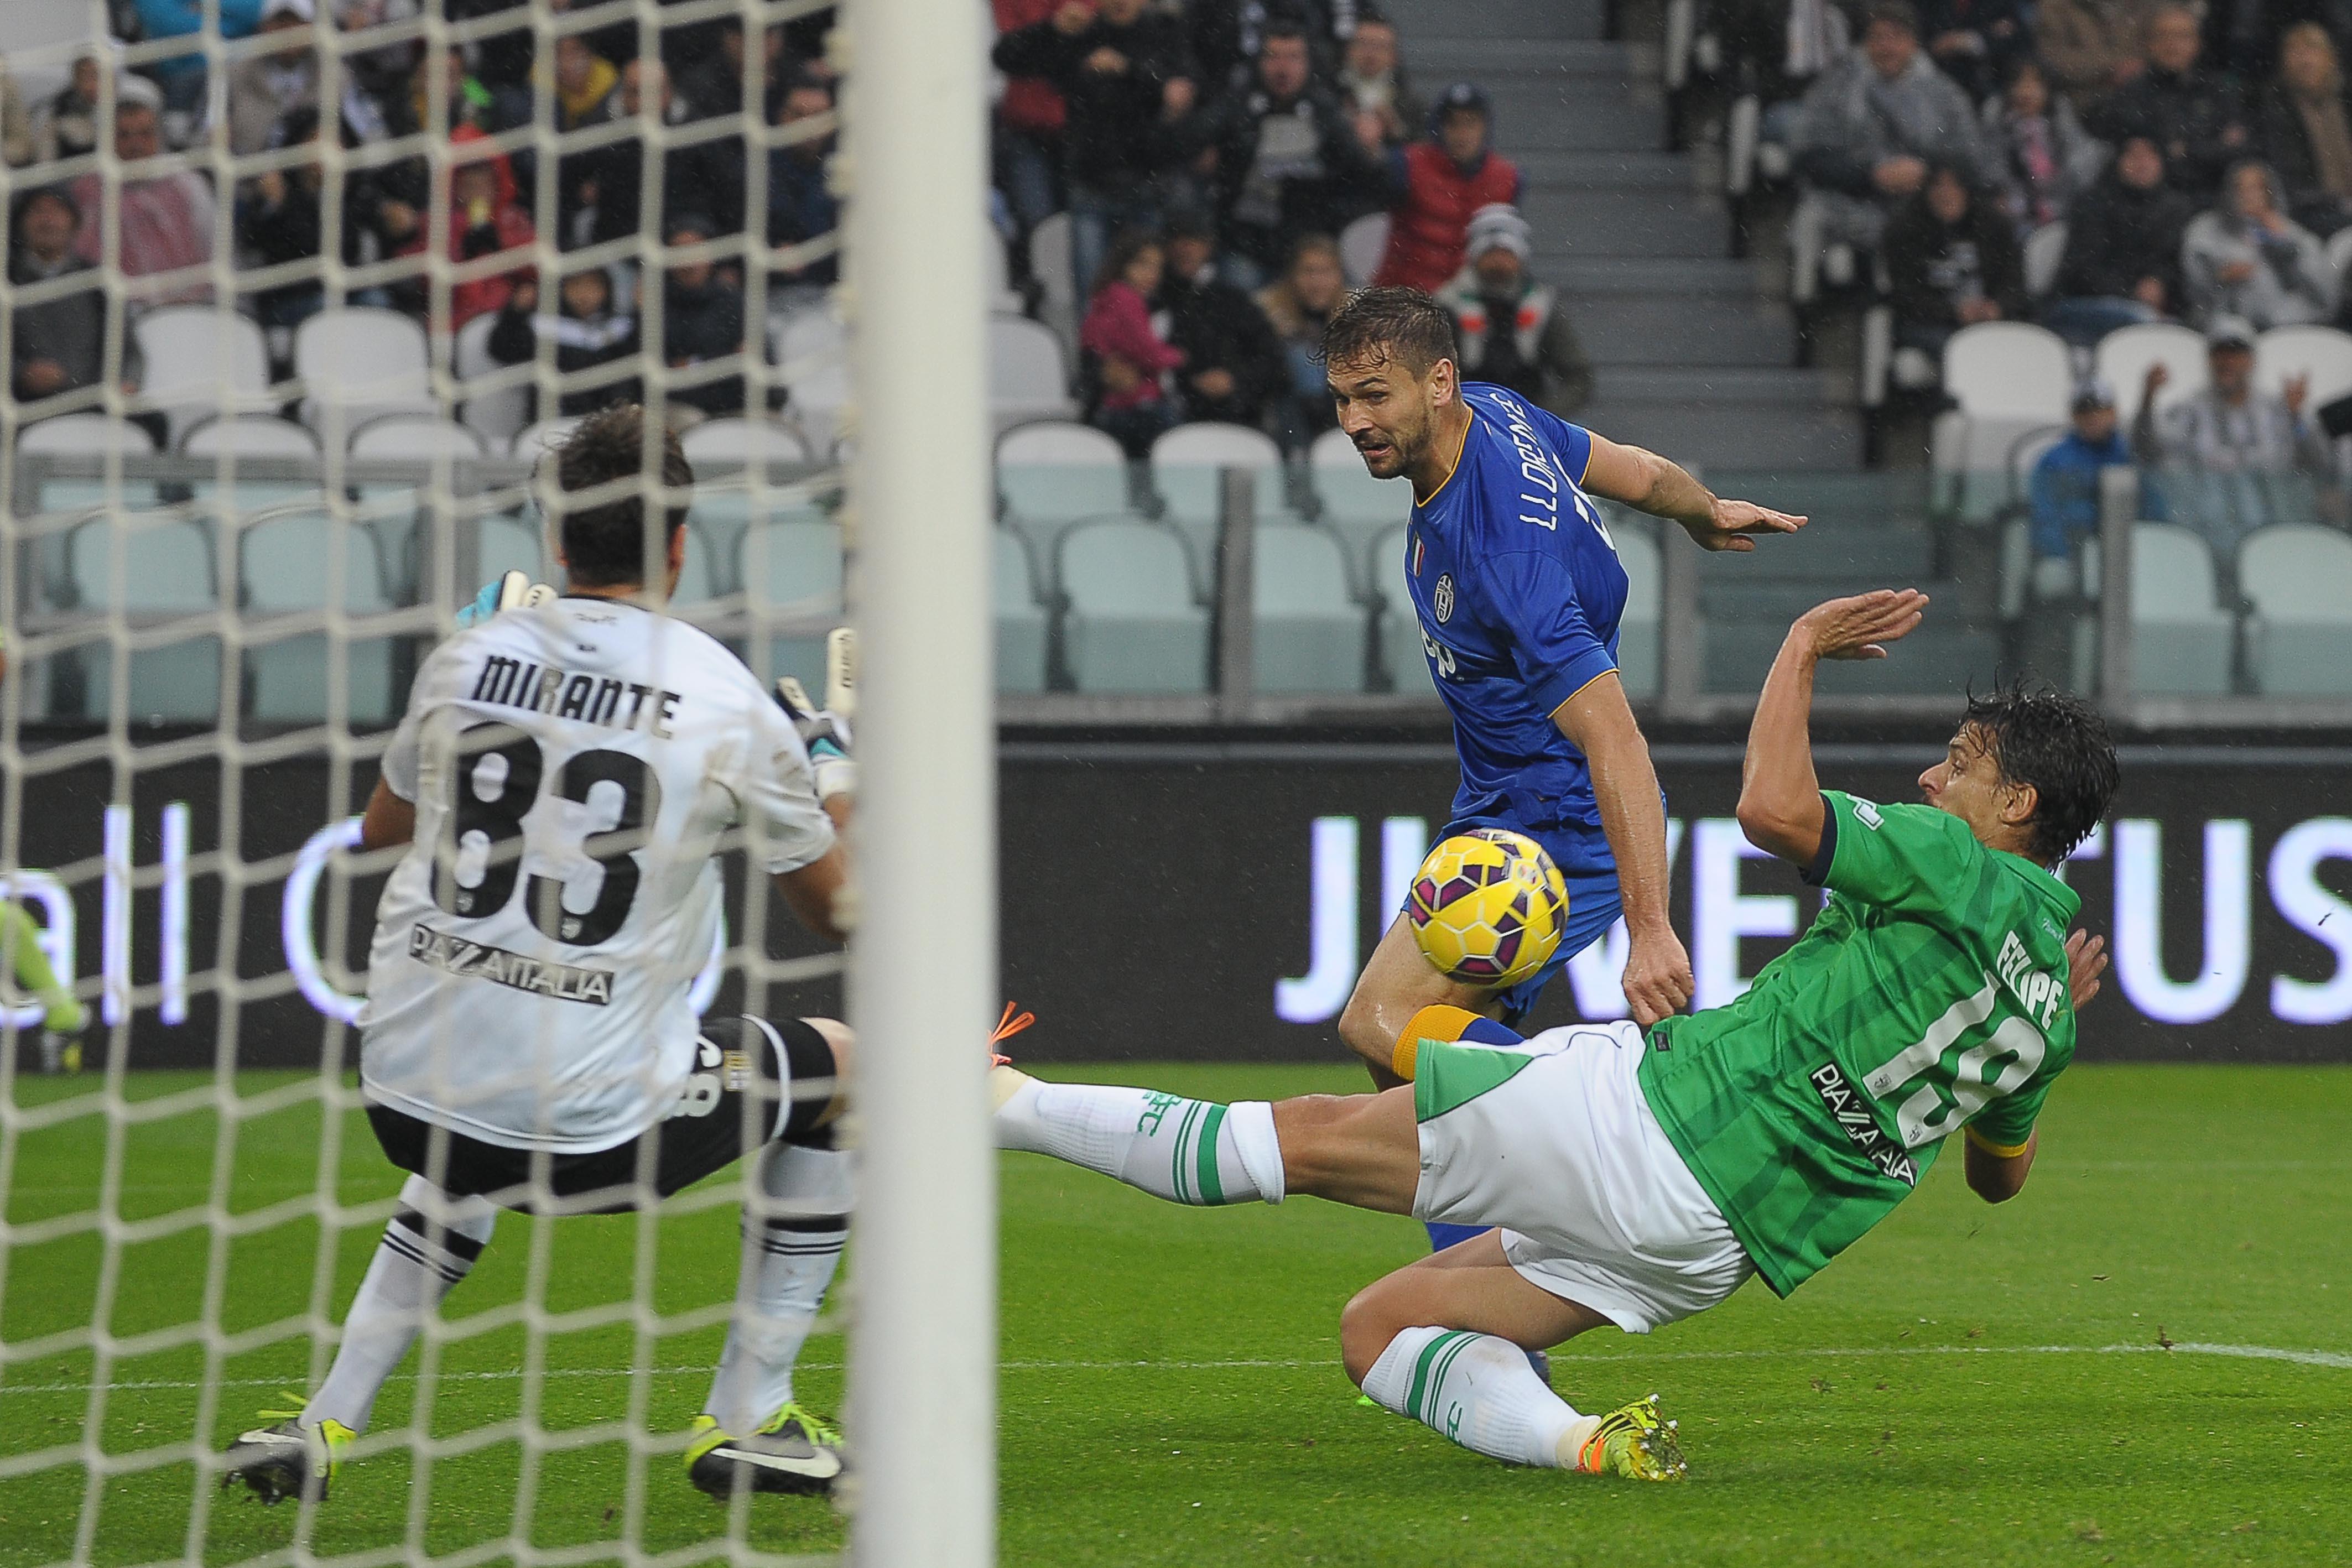 Sampdoria - Parma maçı istatistikleri 85